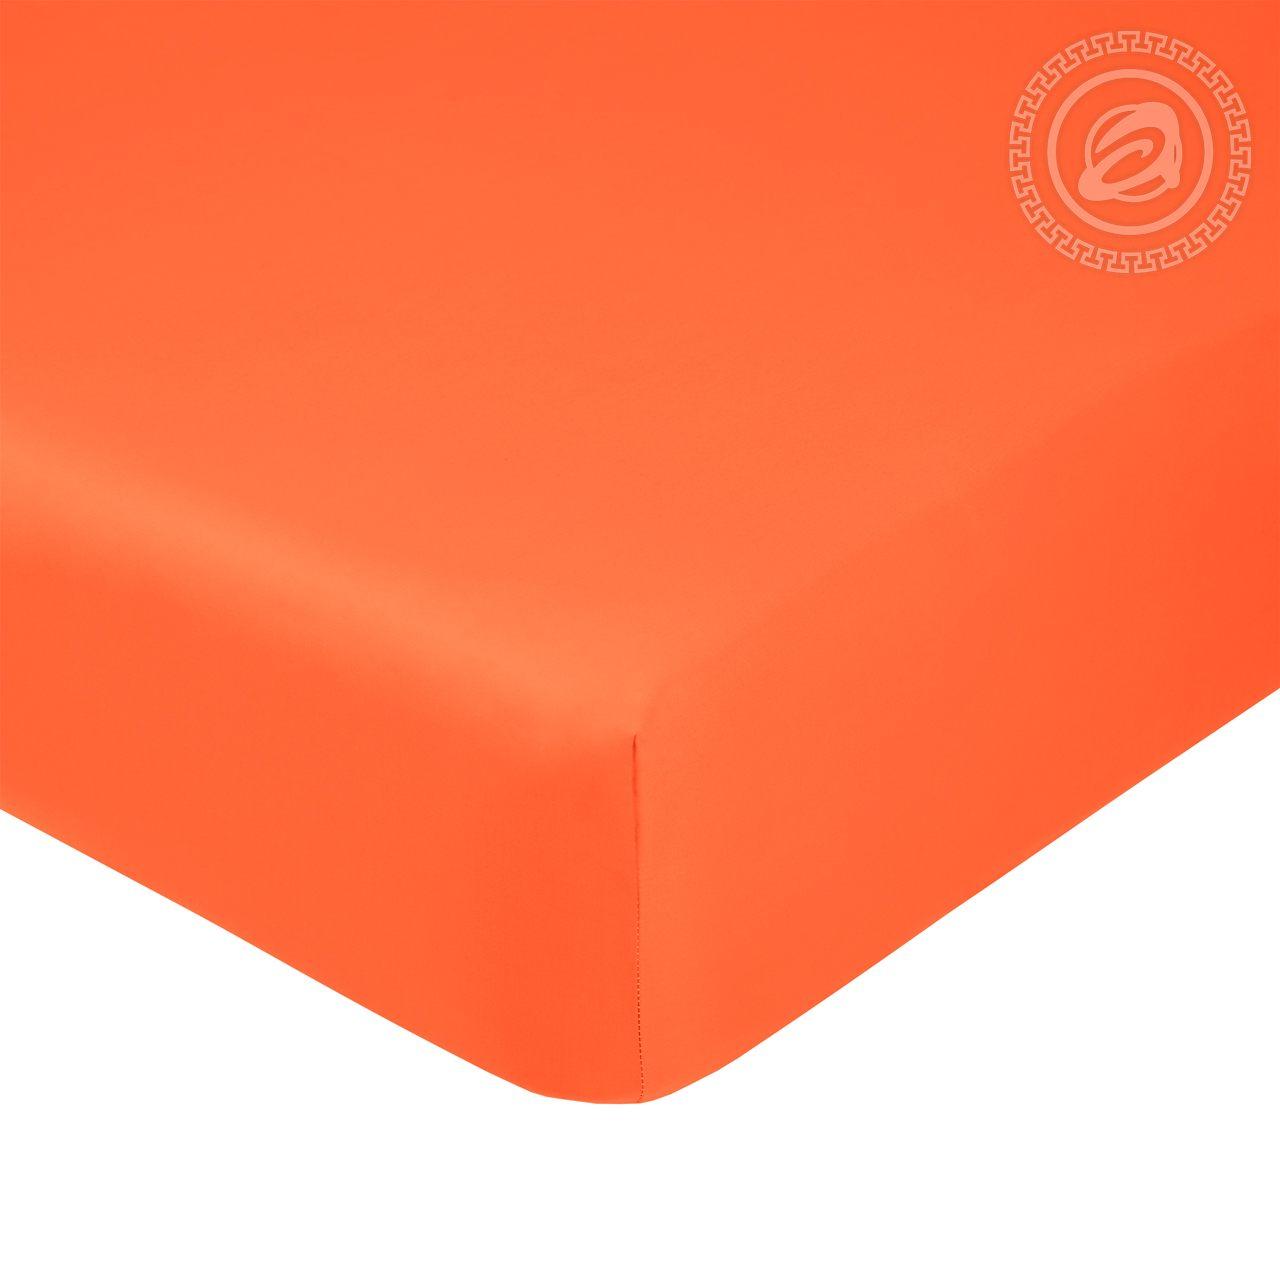 Фото - Простыня на резинке iv61983 (сатин) (140х200) простыня на резинке 140х200 см поплин браво м507 12 04